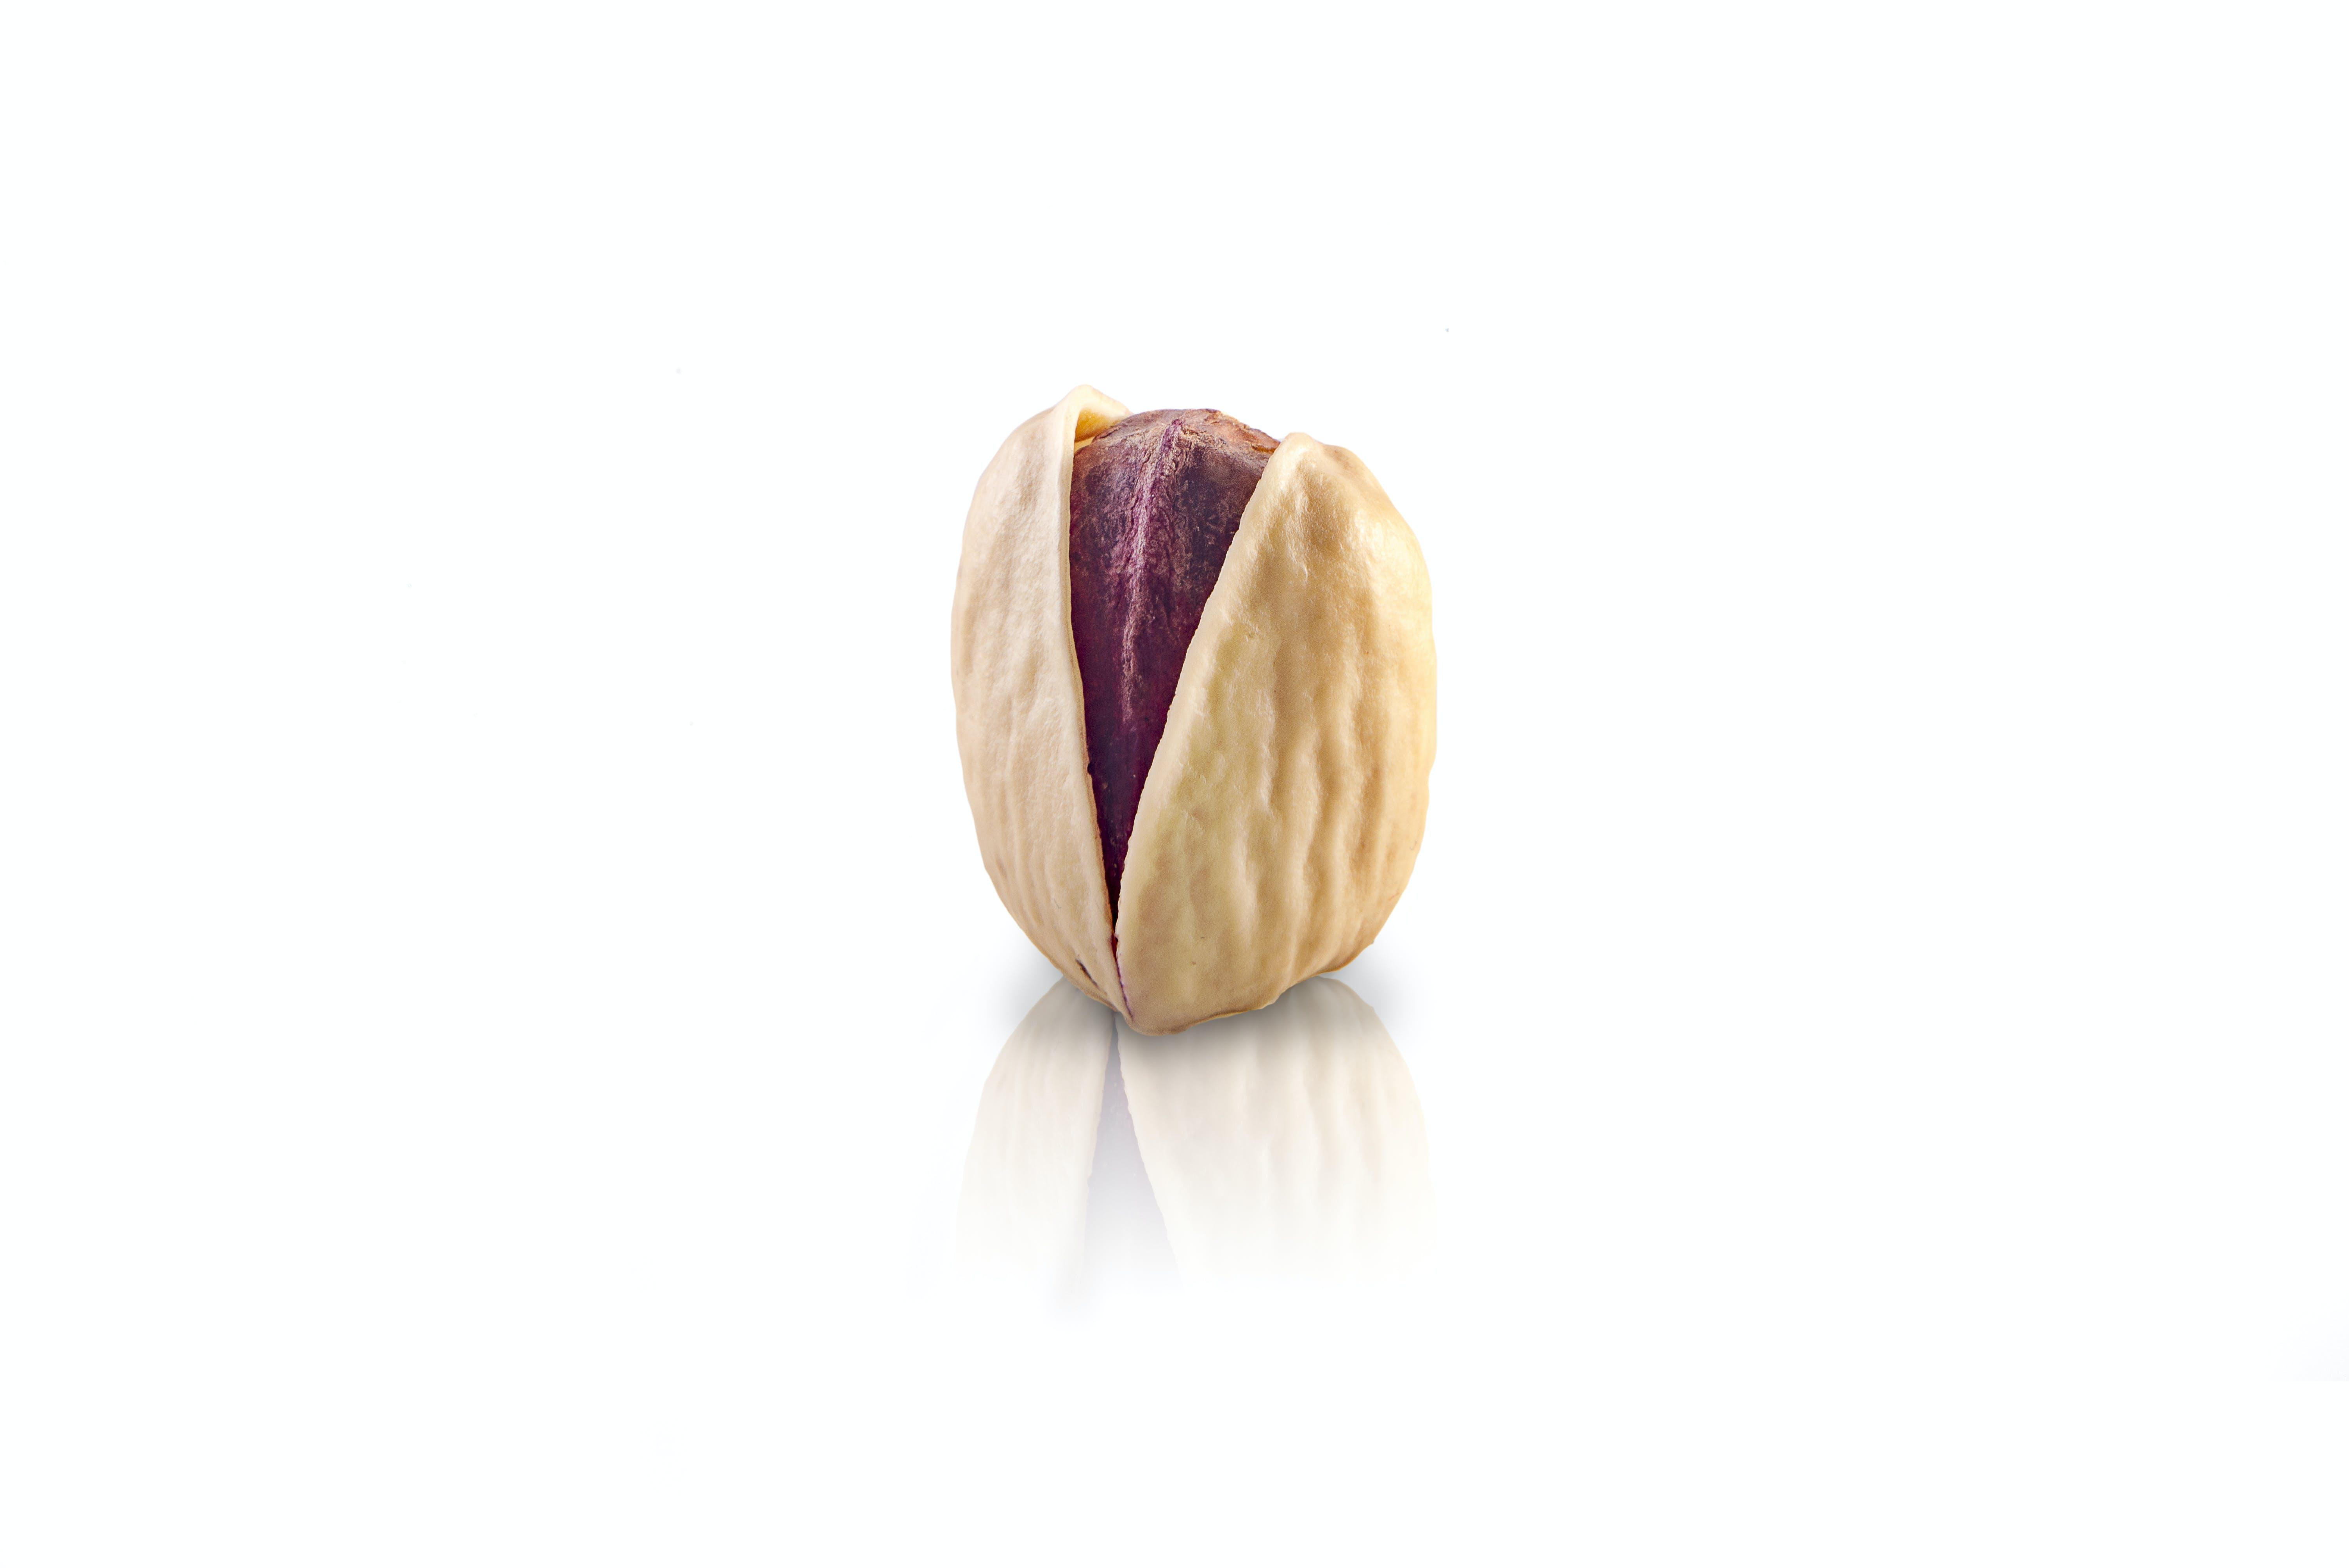 asian food, pistachios